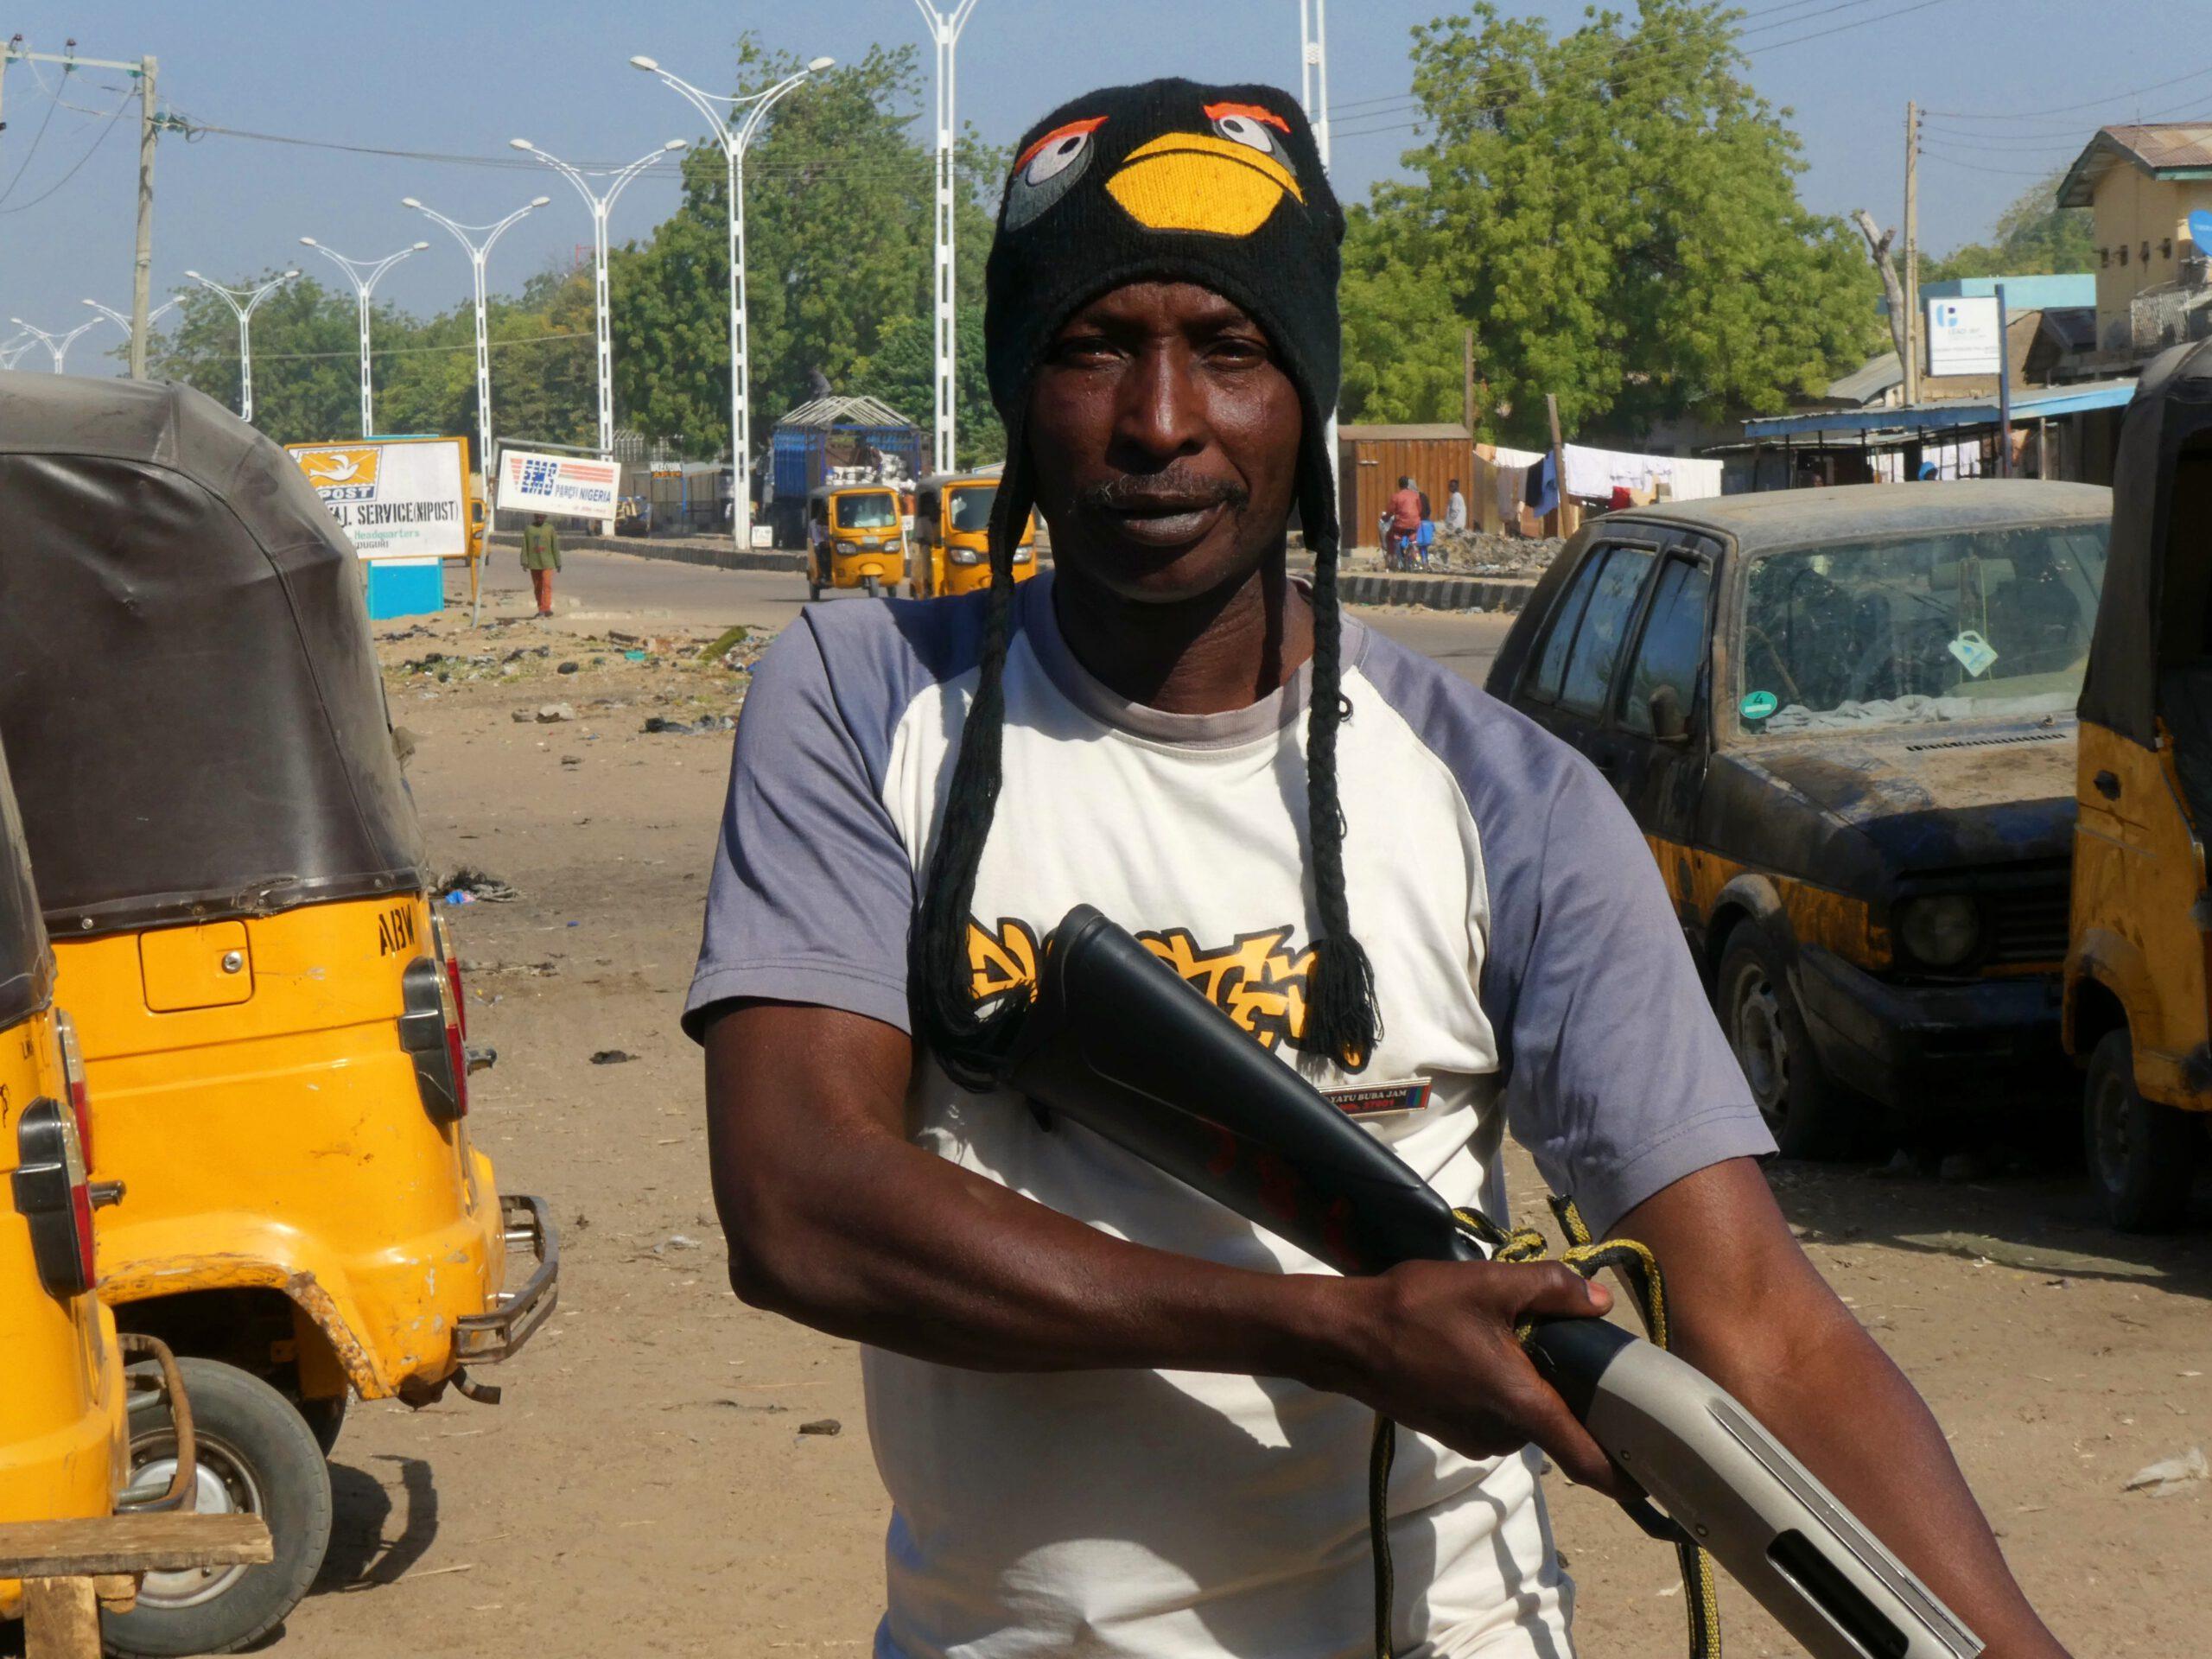 Un civilian mostrando su poderio en Maiduguri